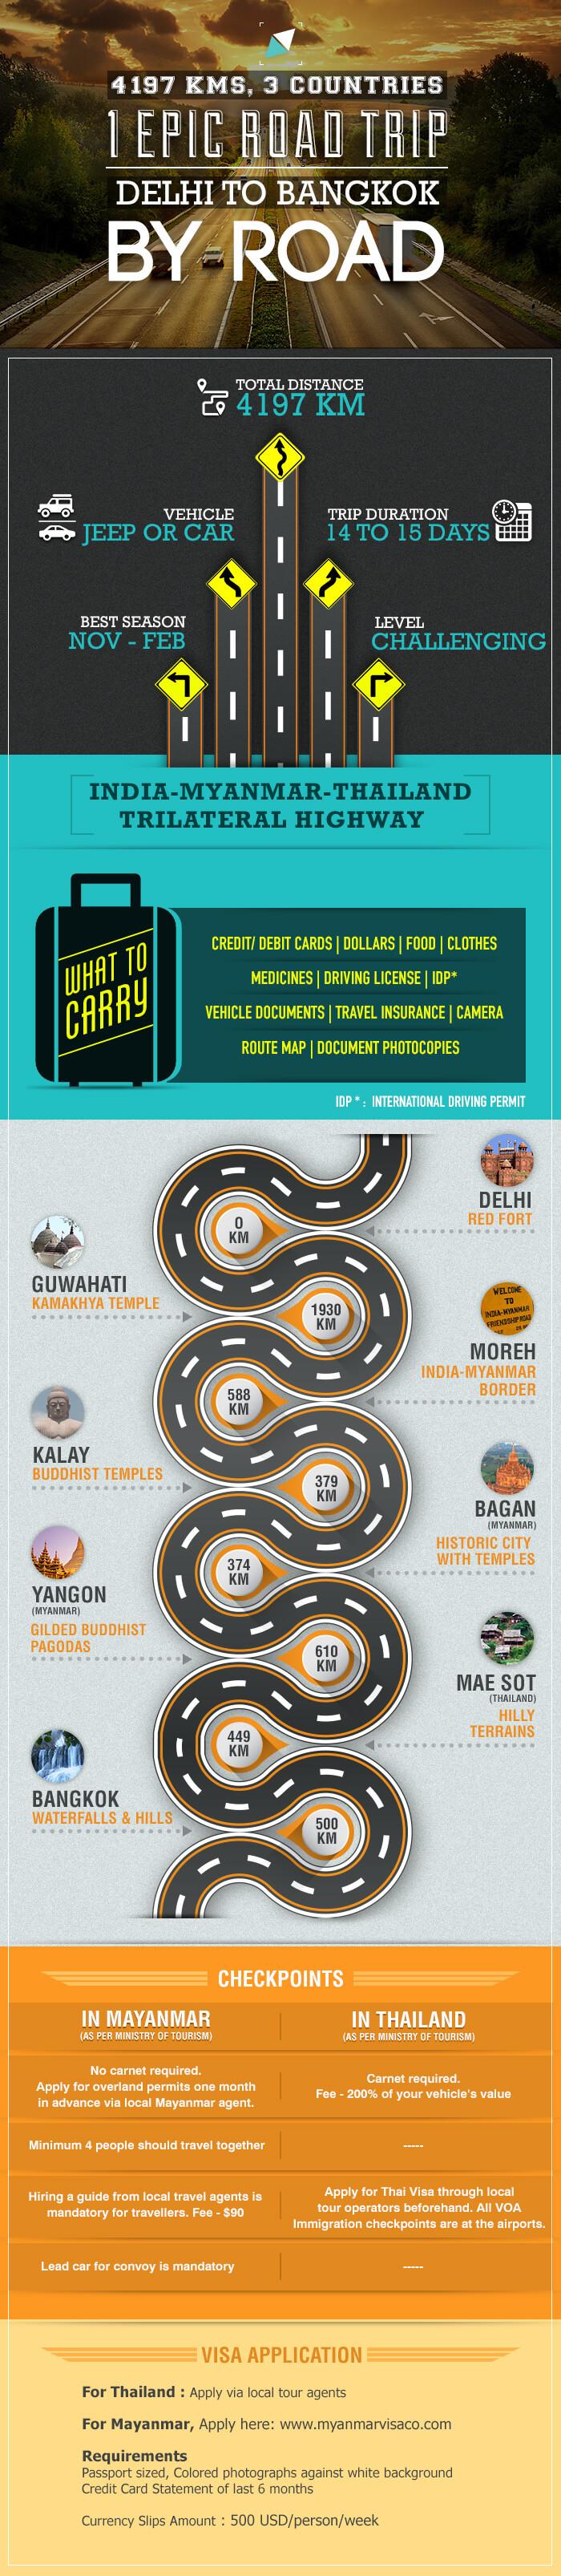 The Epic Road Trip - New Delhi to Bangkok- infographic